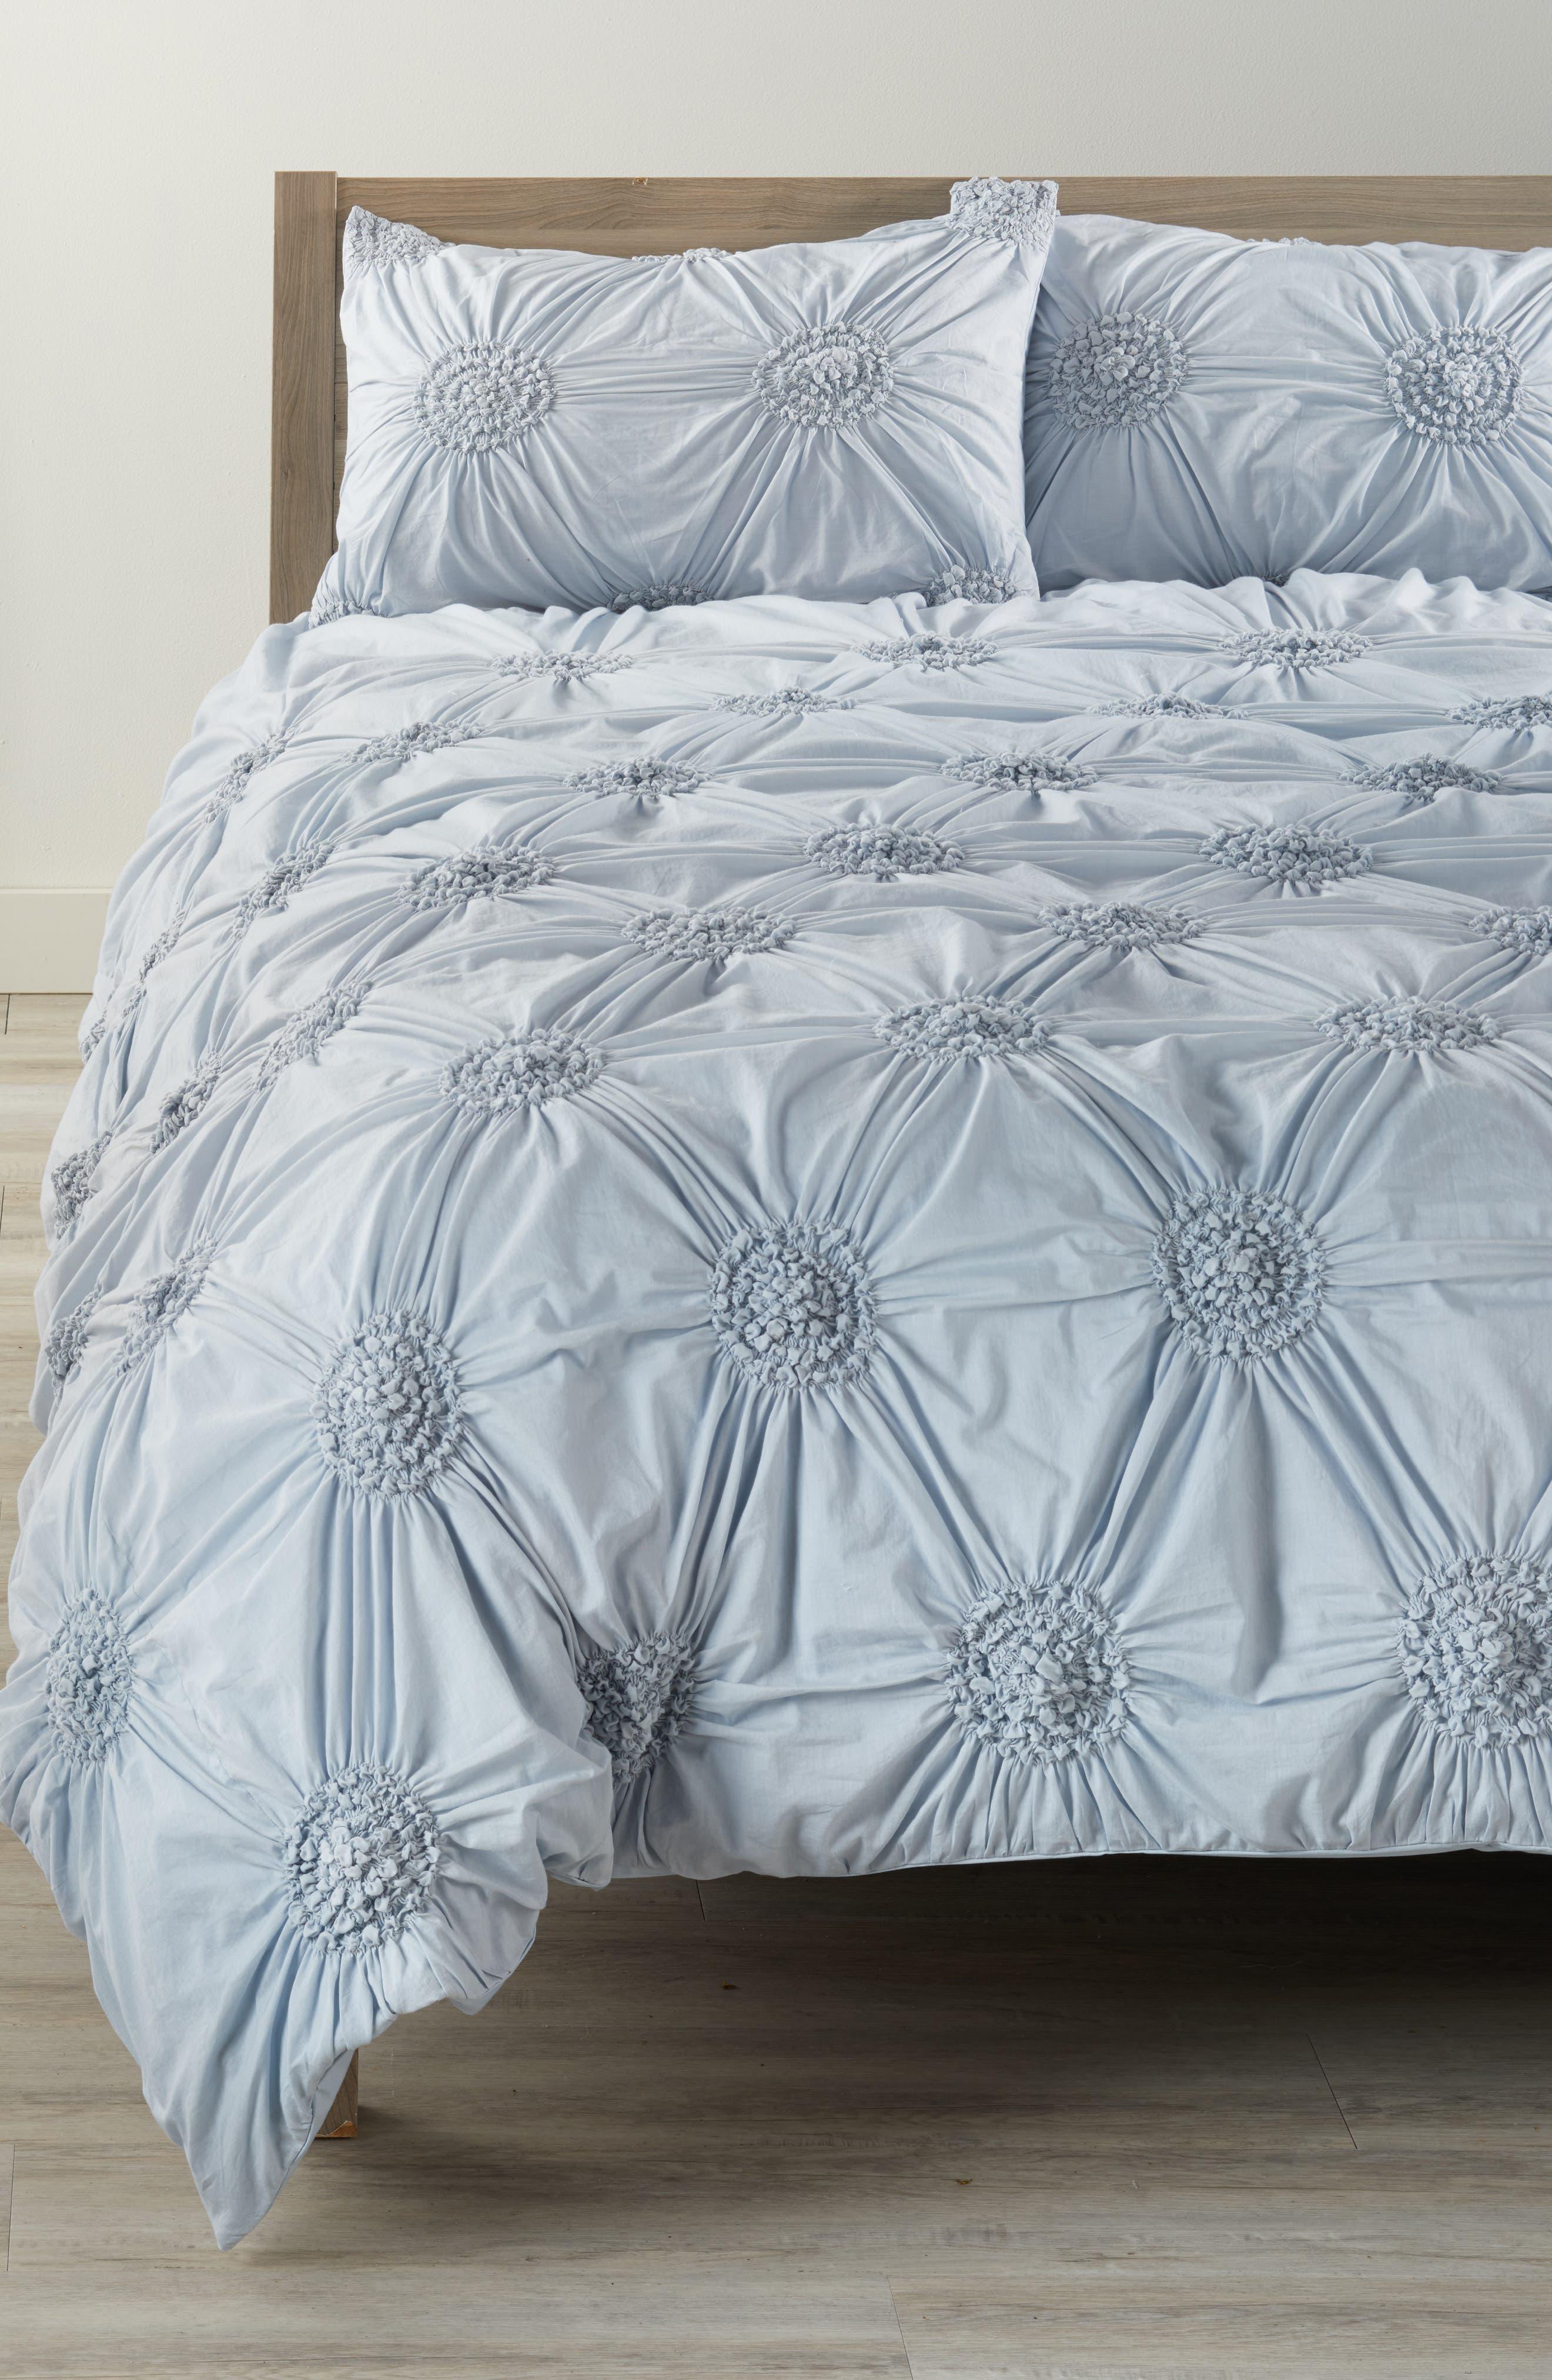 Plum and green bedding - Plum And Green Bedding 15